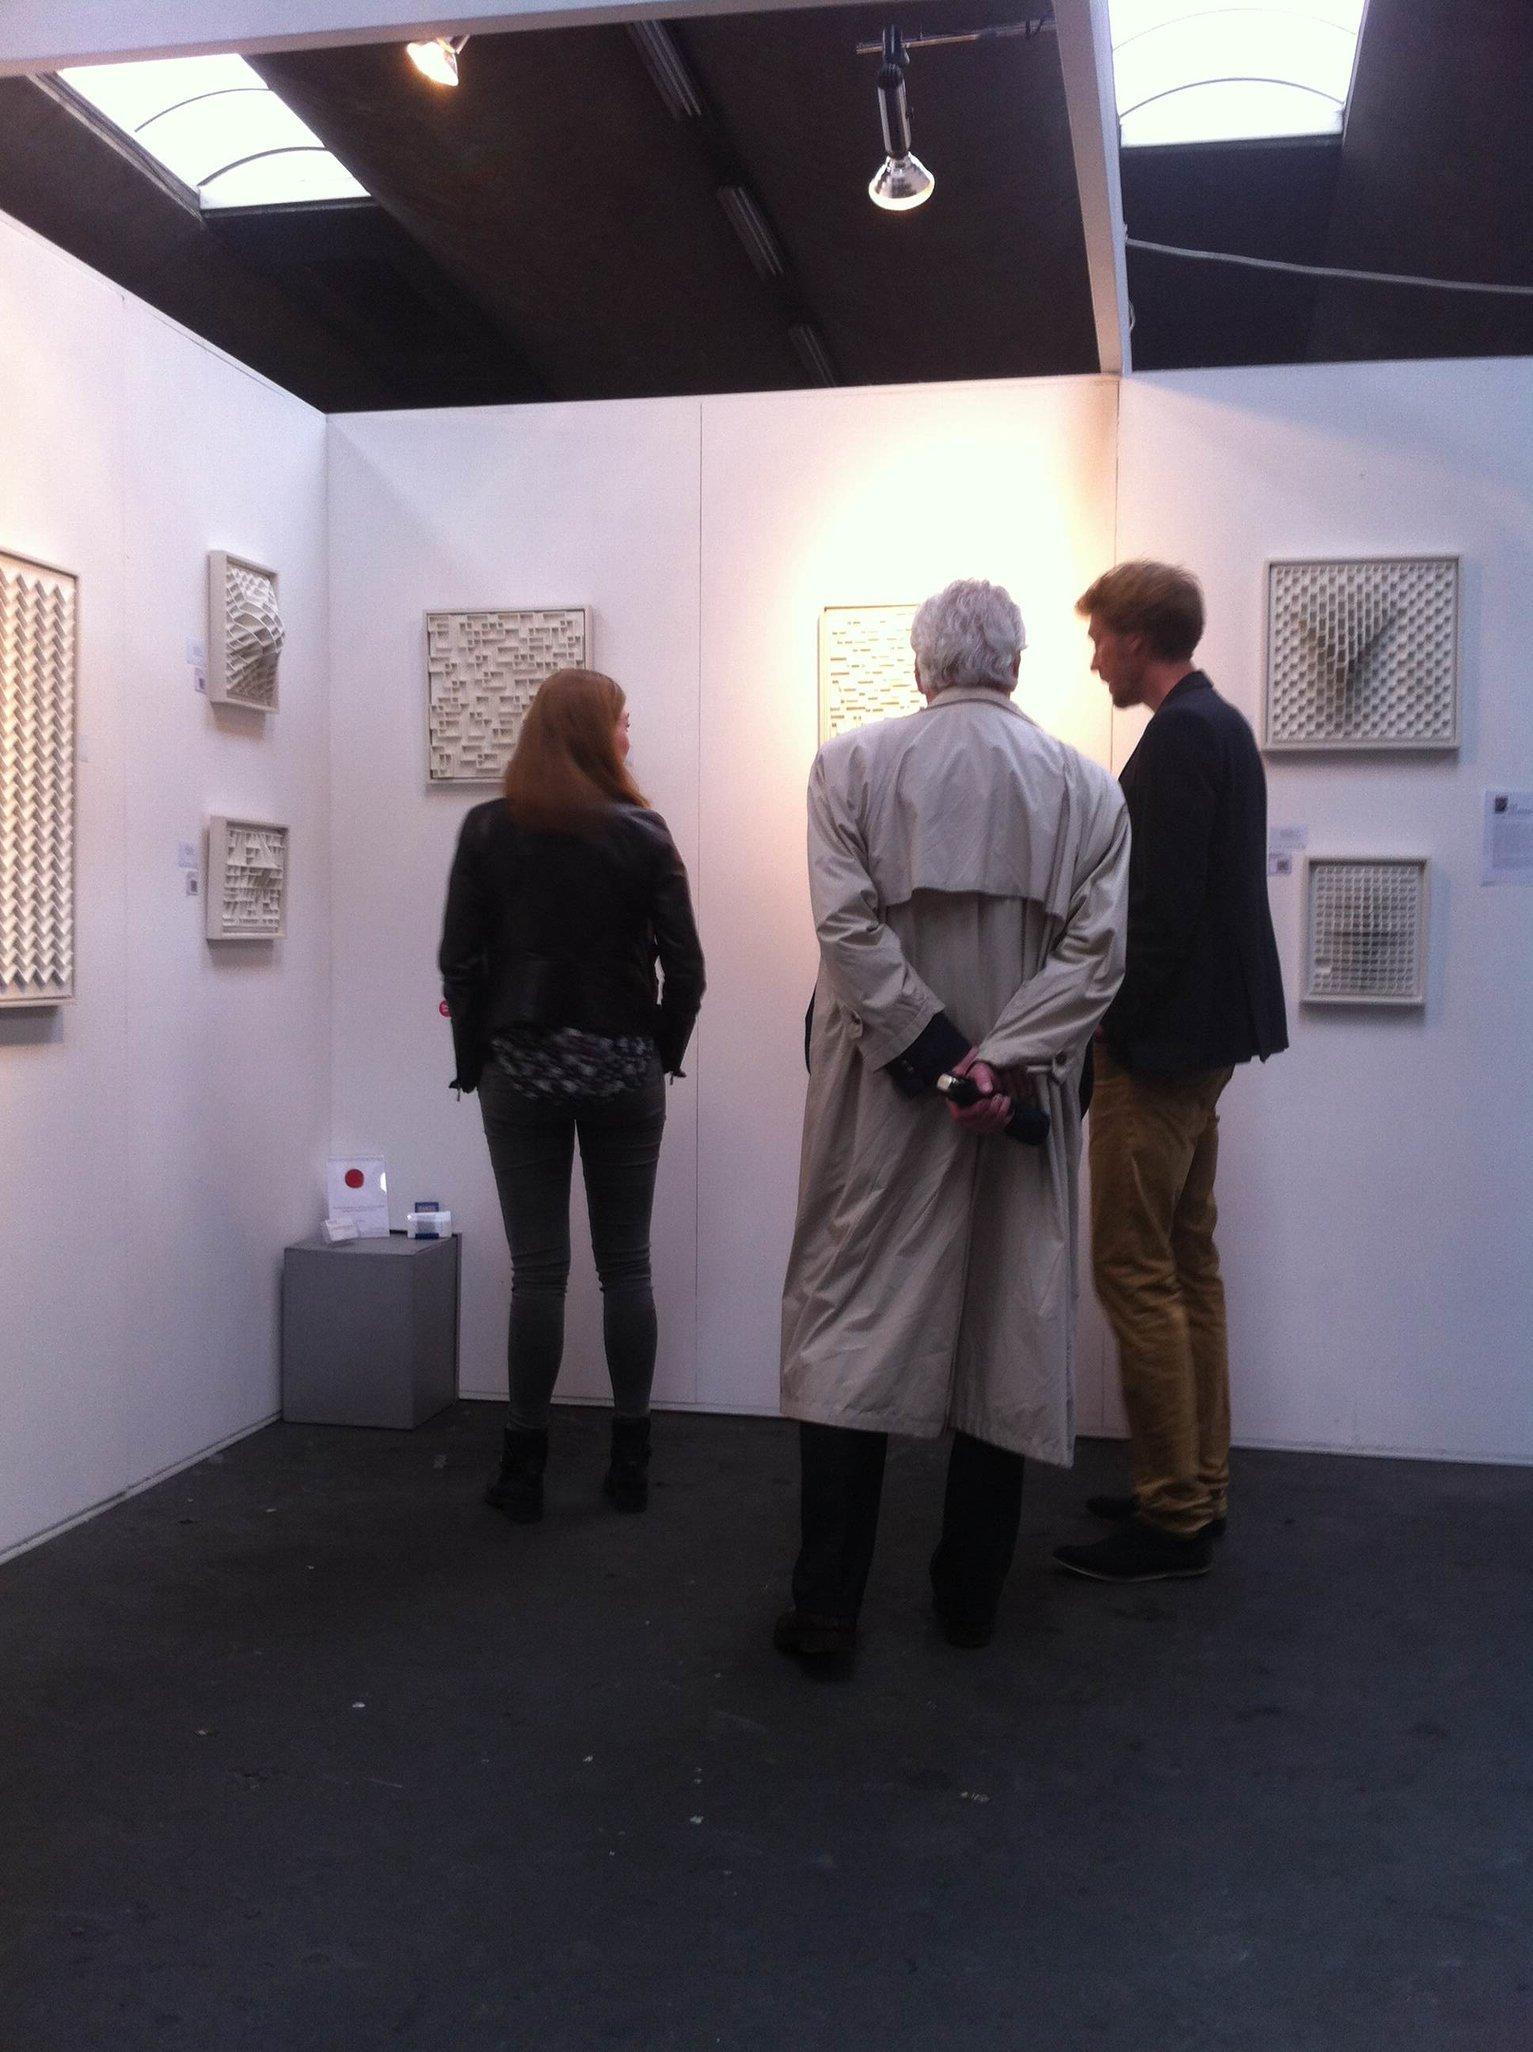 Rob-van-Hemert, ArtZaanstad3 (2016).JPG